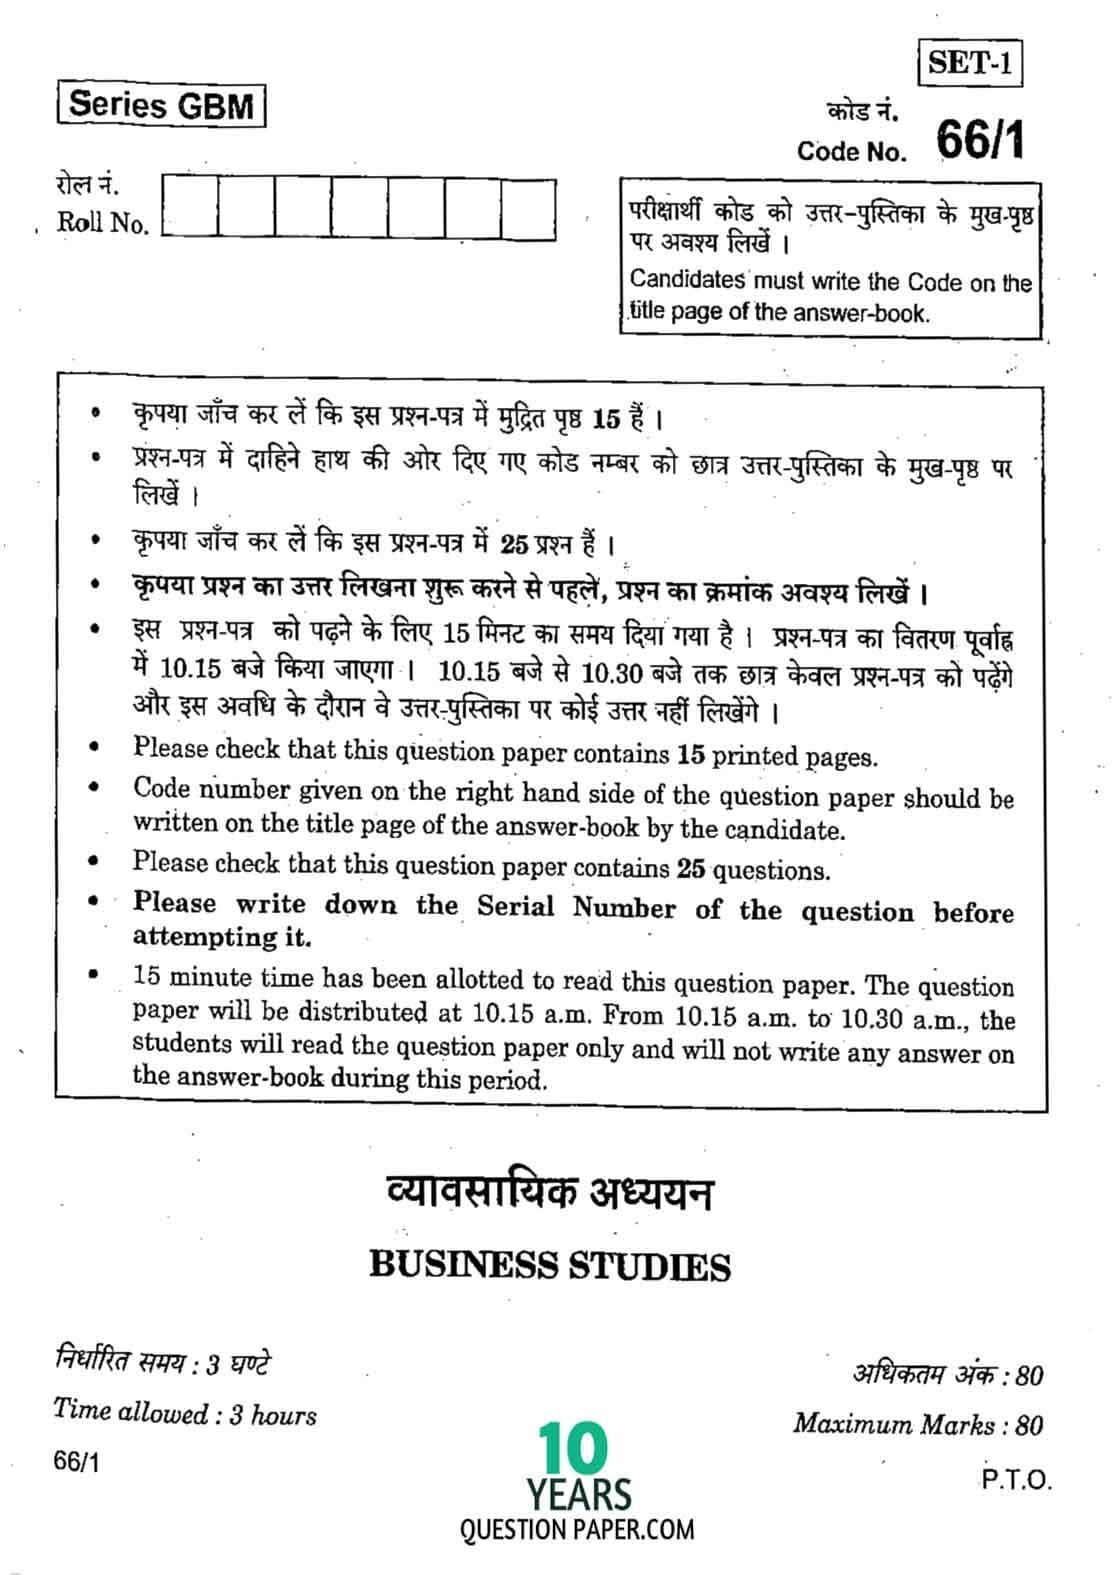 cbse class 12th 2017  Business Studies question paper set-1